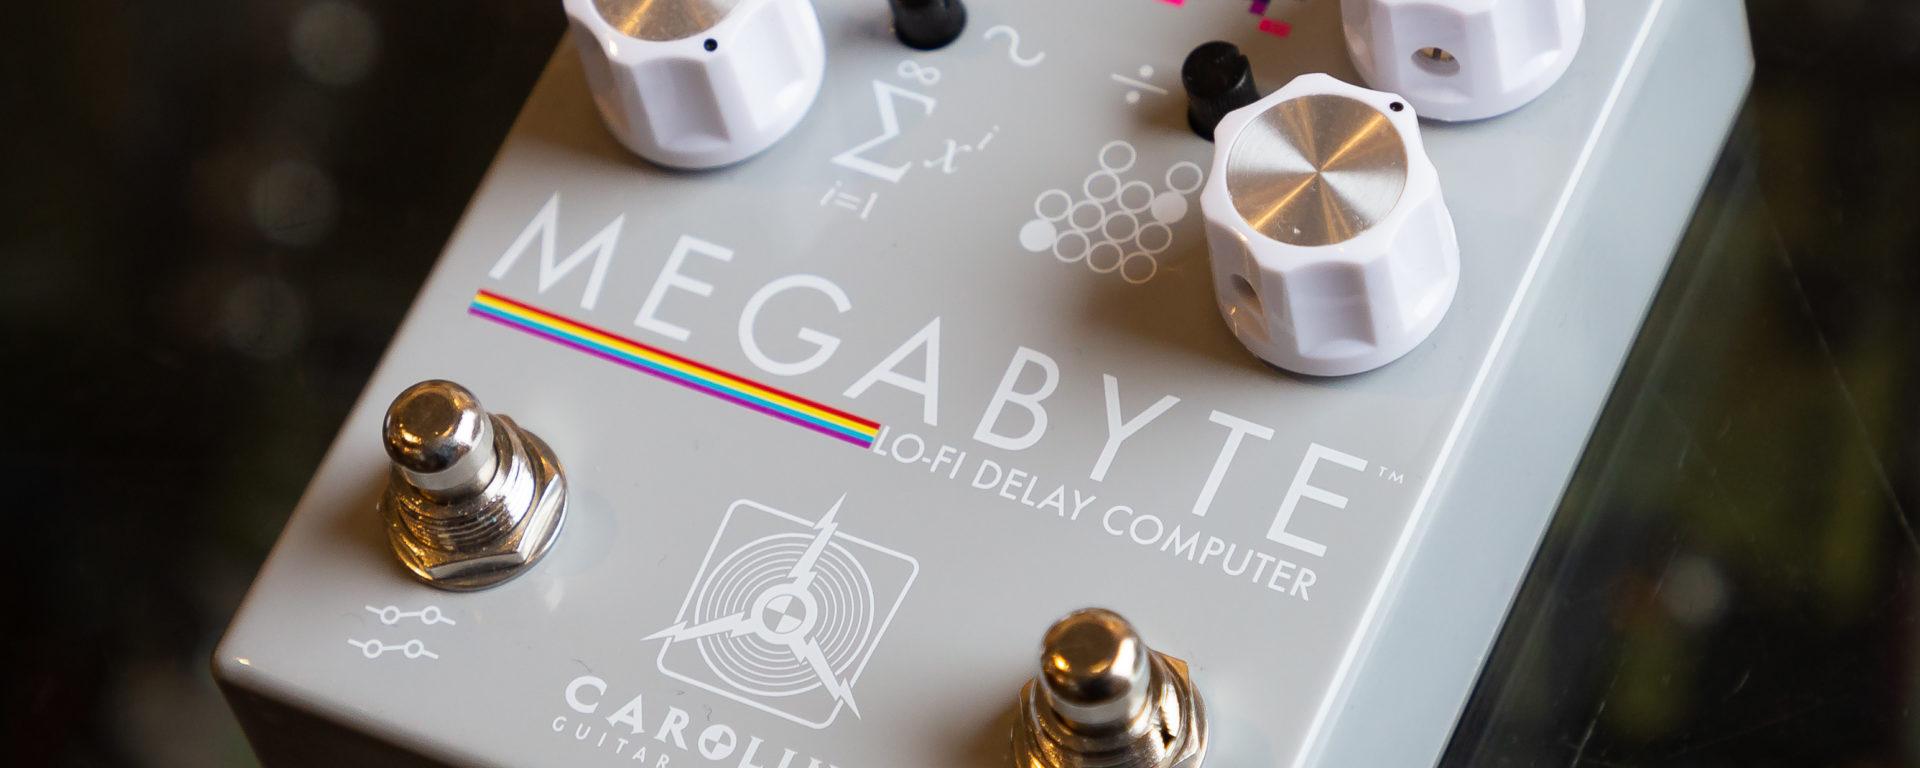 Caroline Effect Pedals - Megabyte Lo-Fi Delay